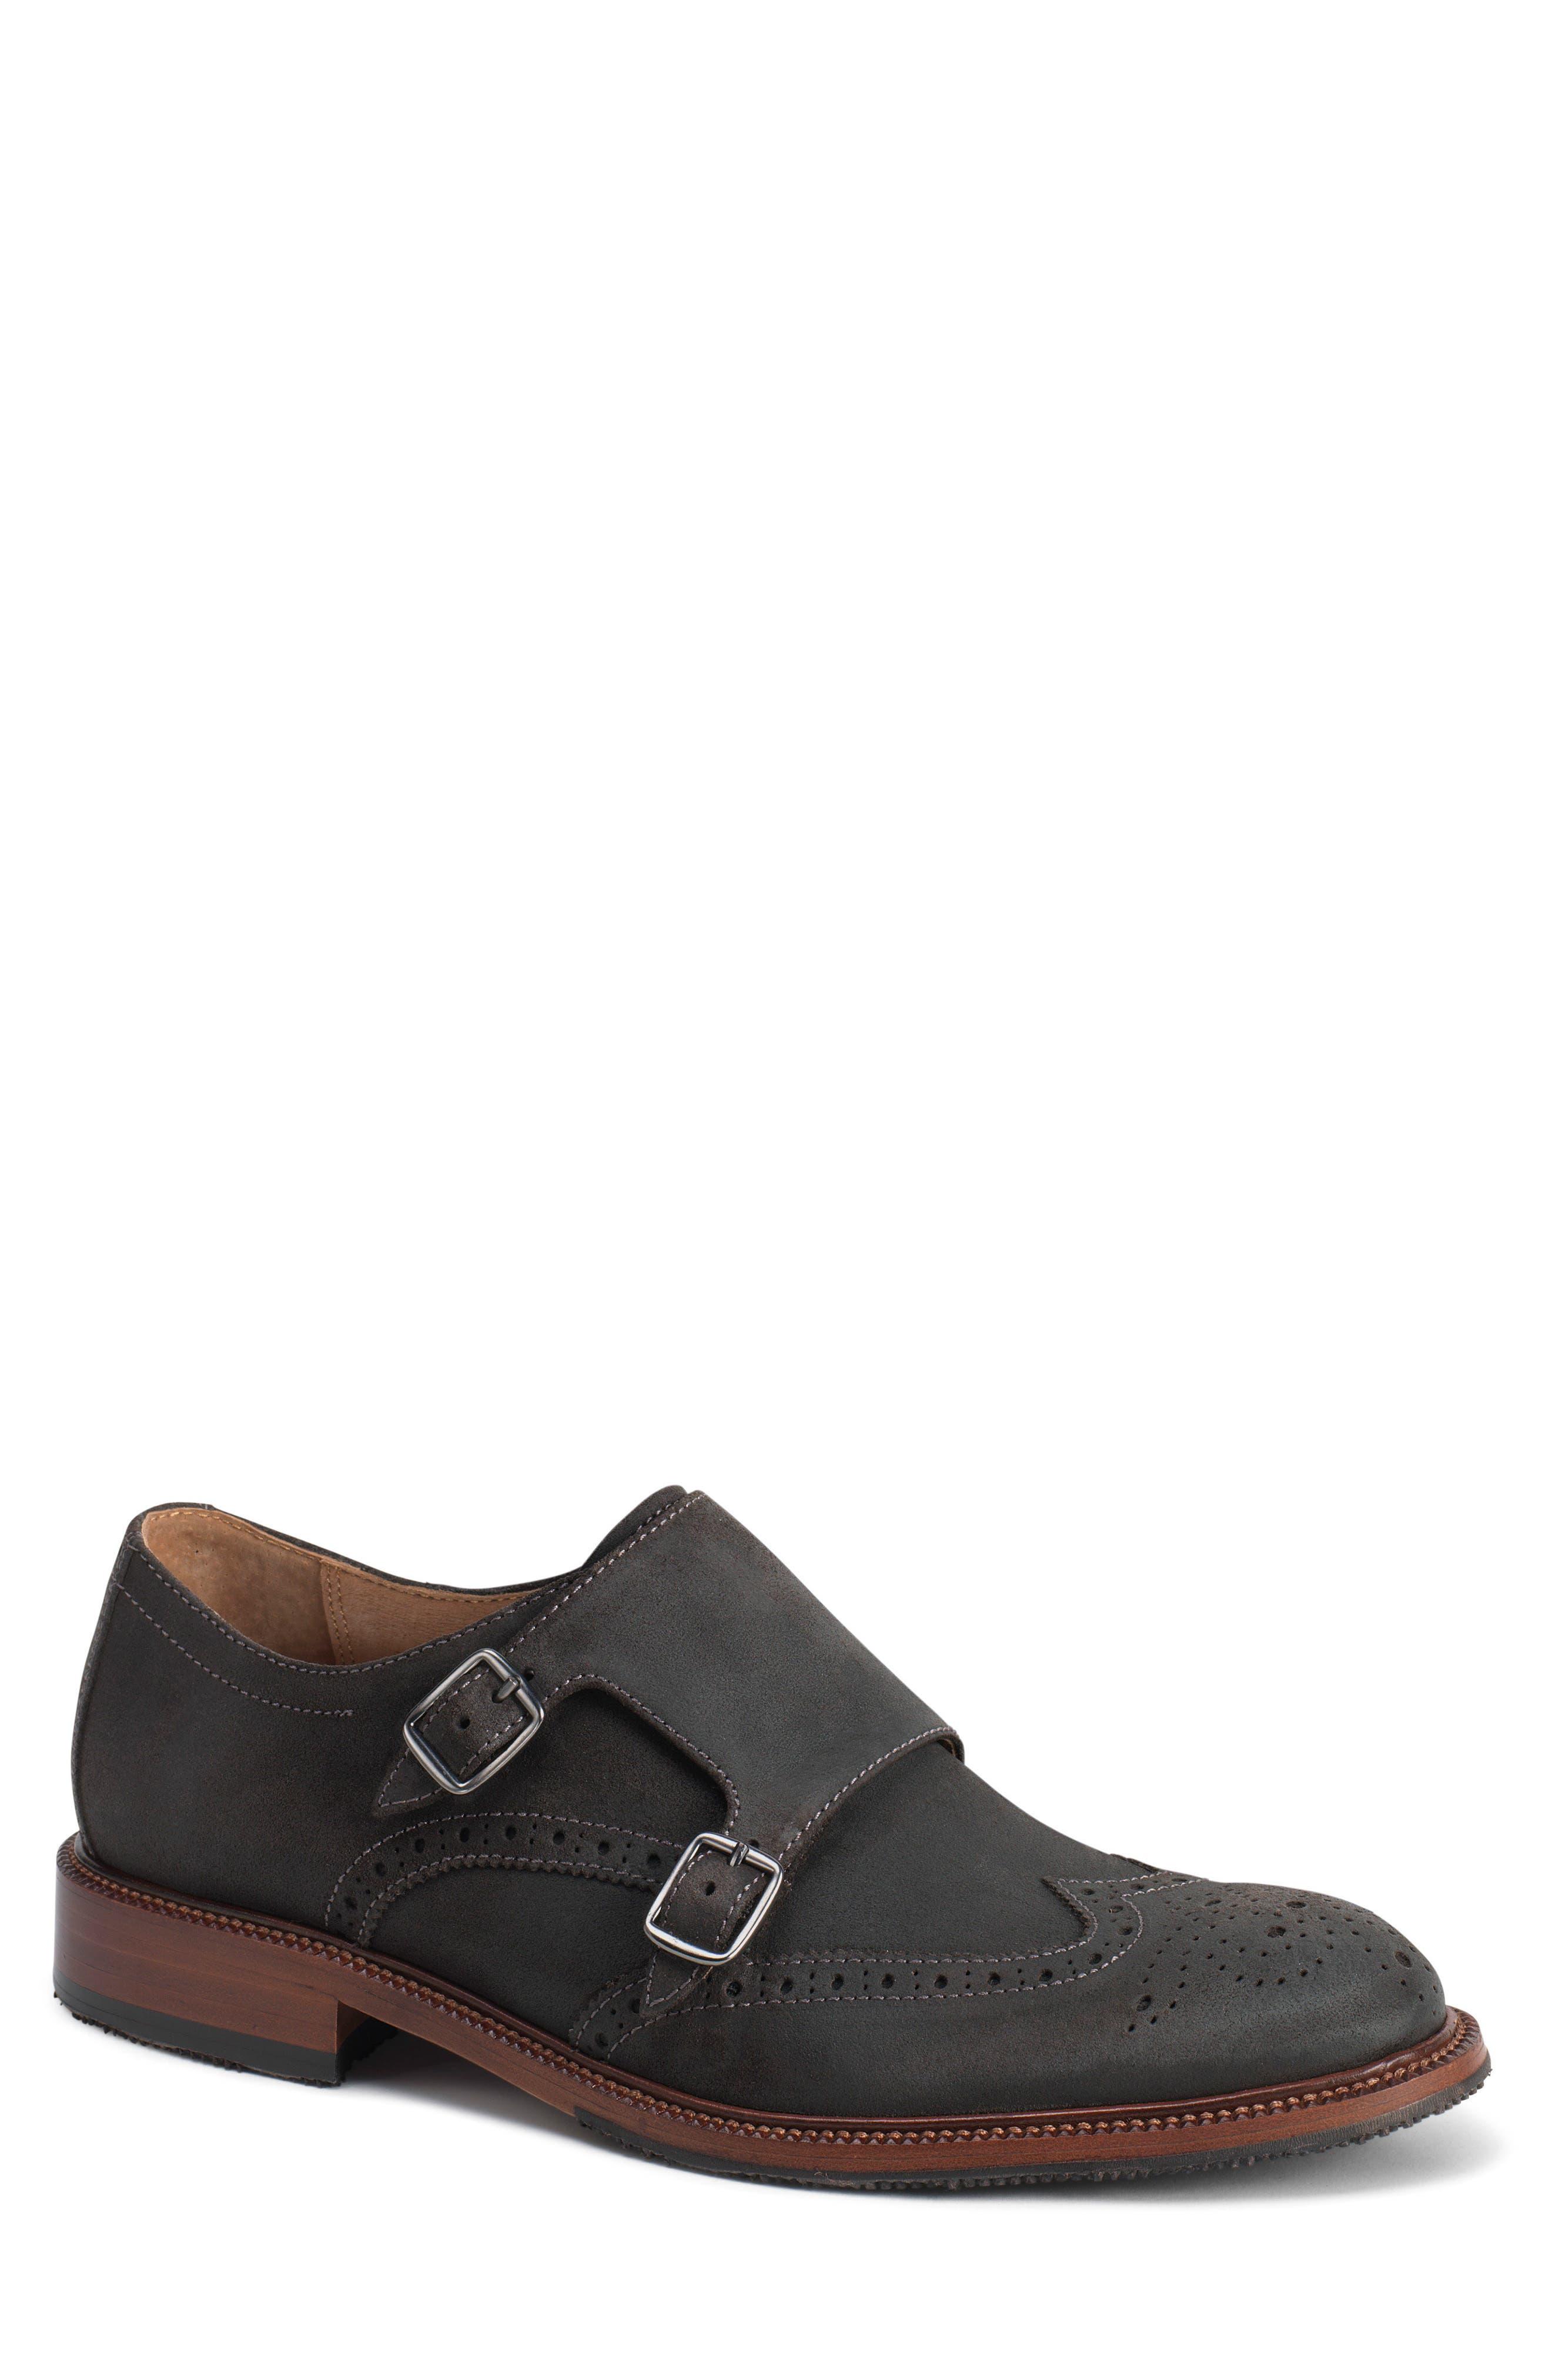 TRASK, Leland Double Monk Strap Shoe, Main thumbnail 1, color, GRAY WAXED SUEDE